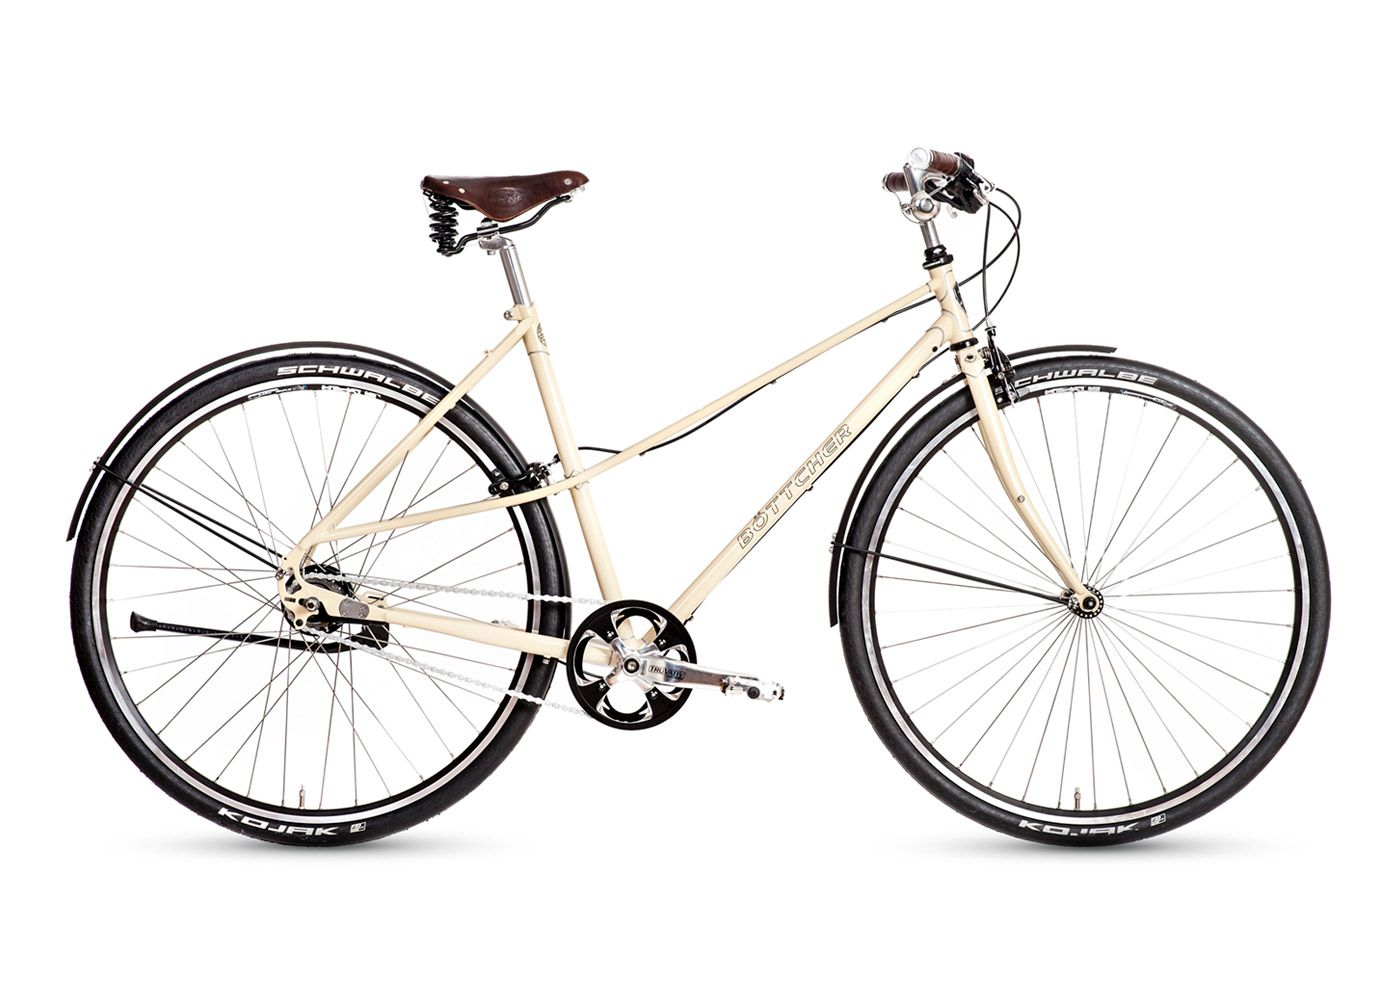 Böttcher Leeds, Mixte (BöttcherFahrräder) Fahrrad